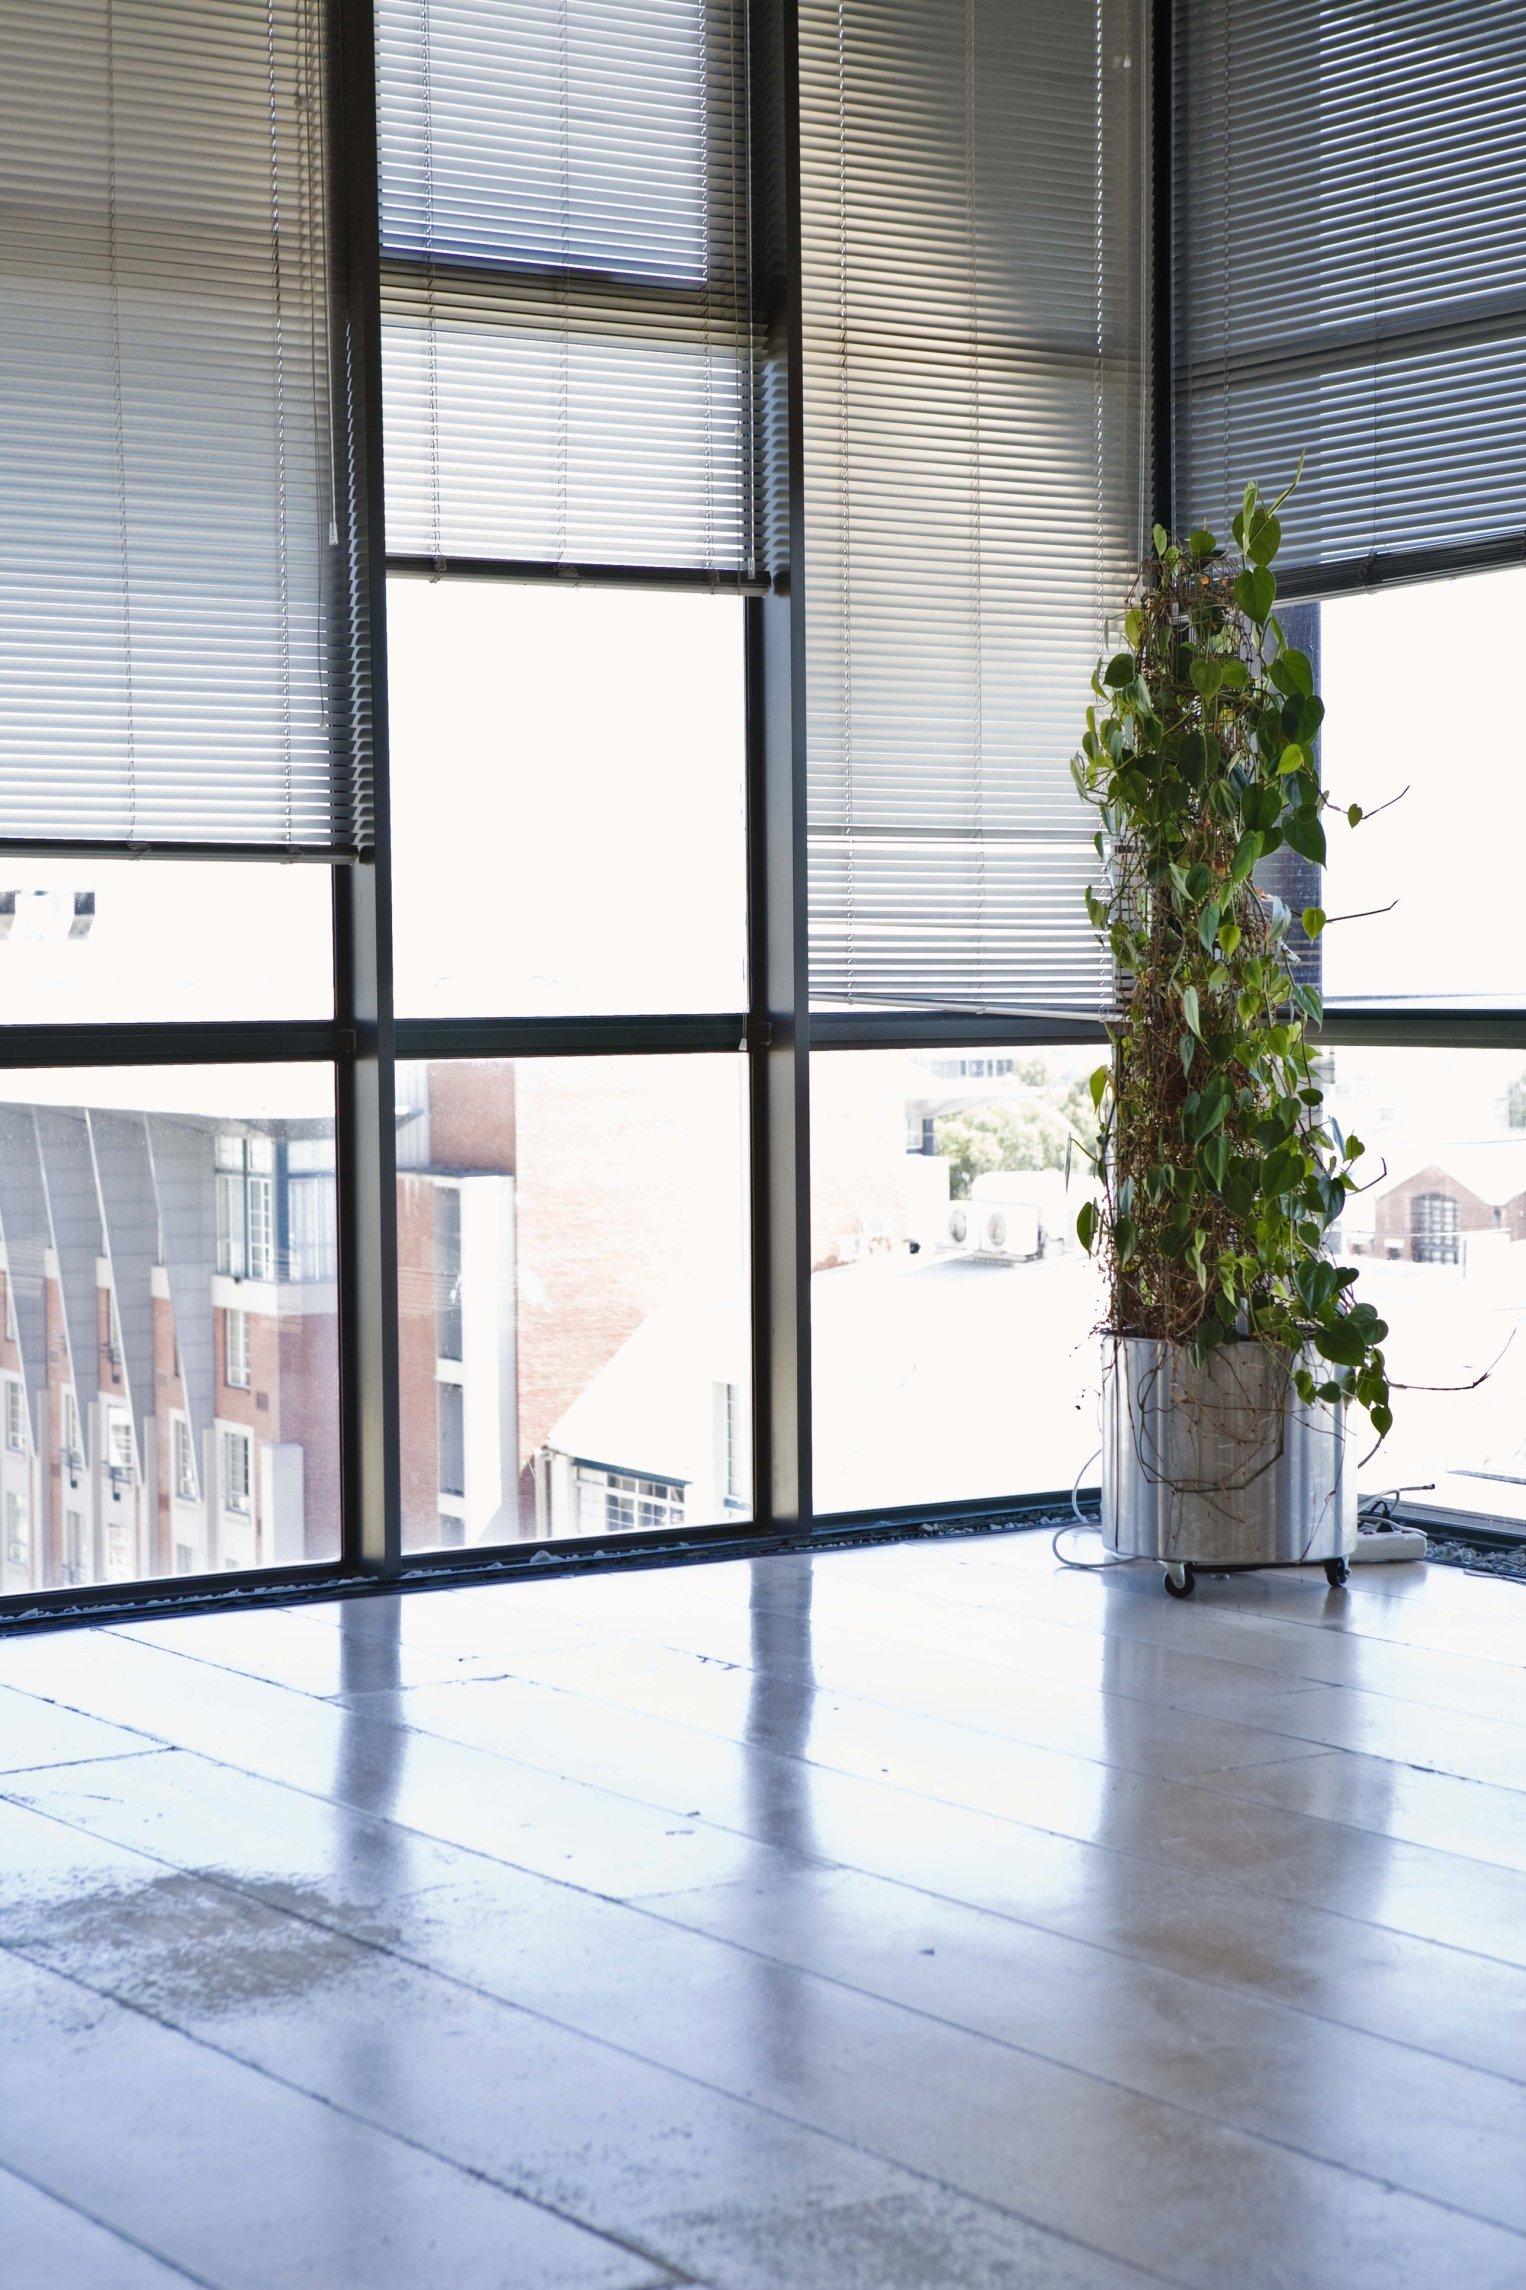 Window Blinds Washington, NC